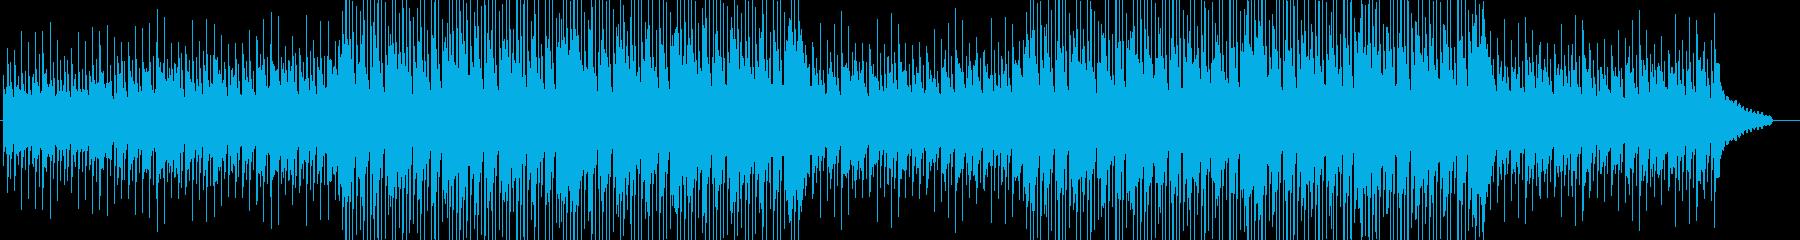 Happy Ukulele 15の再生済みの波形